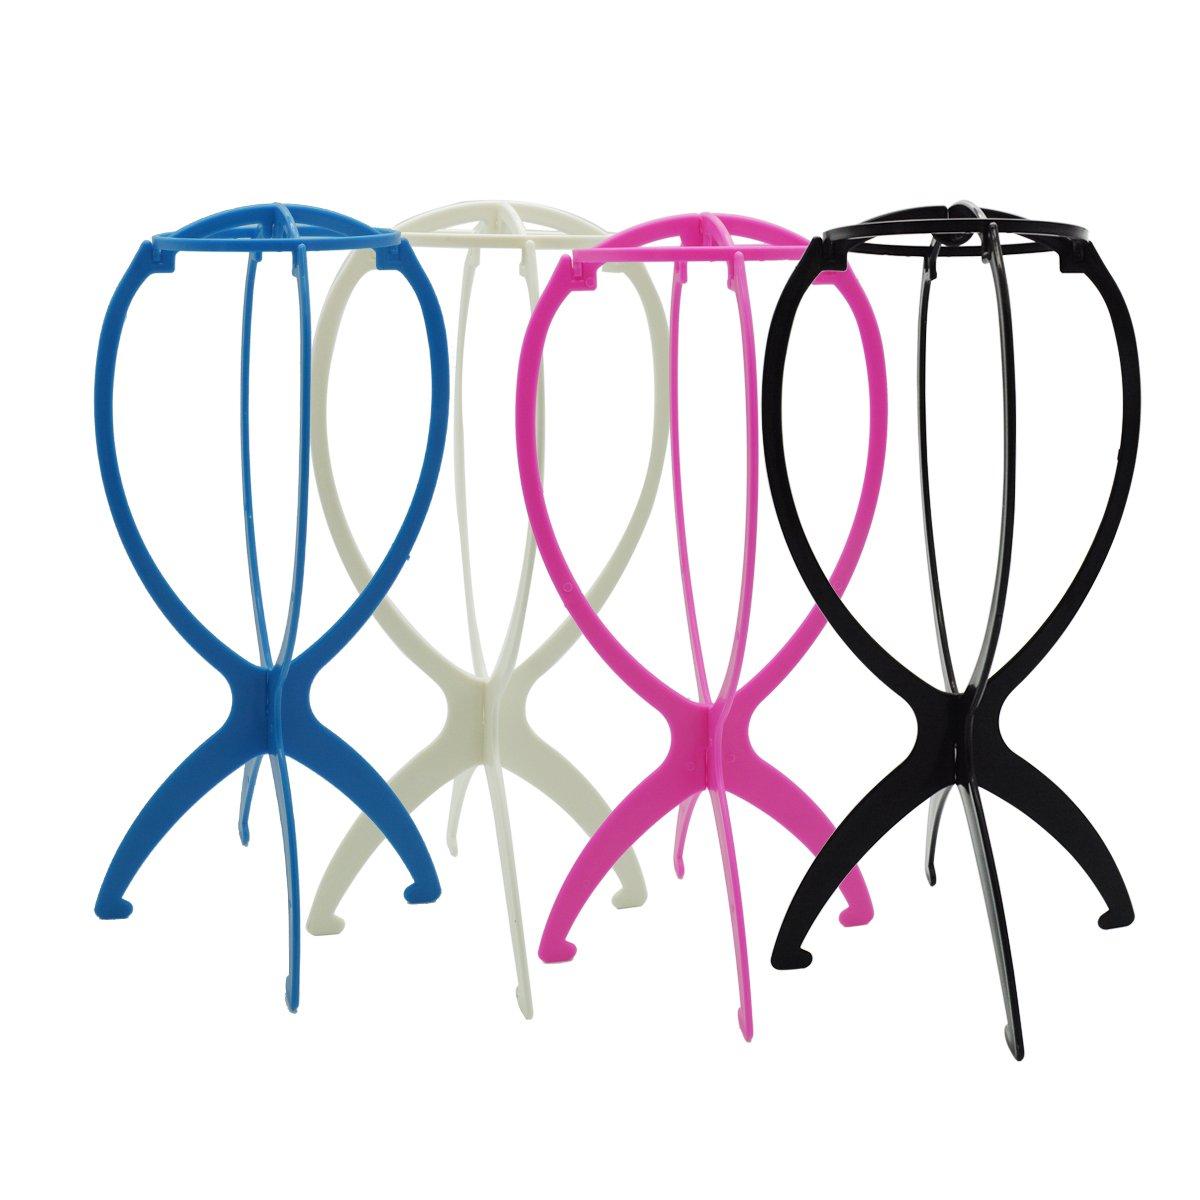 6pcs Wig Holder, YSLF Foldable Wig Holder Stand Wig Display Head Wig Dryer Rack Color Black by YSLF (Image #2)